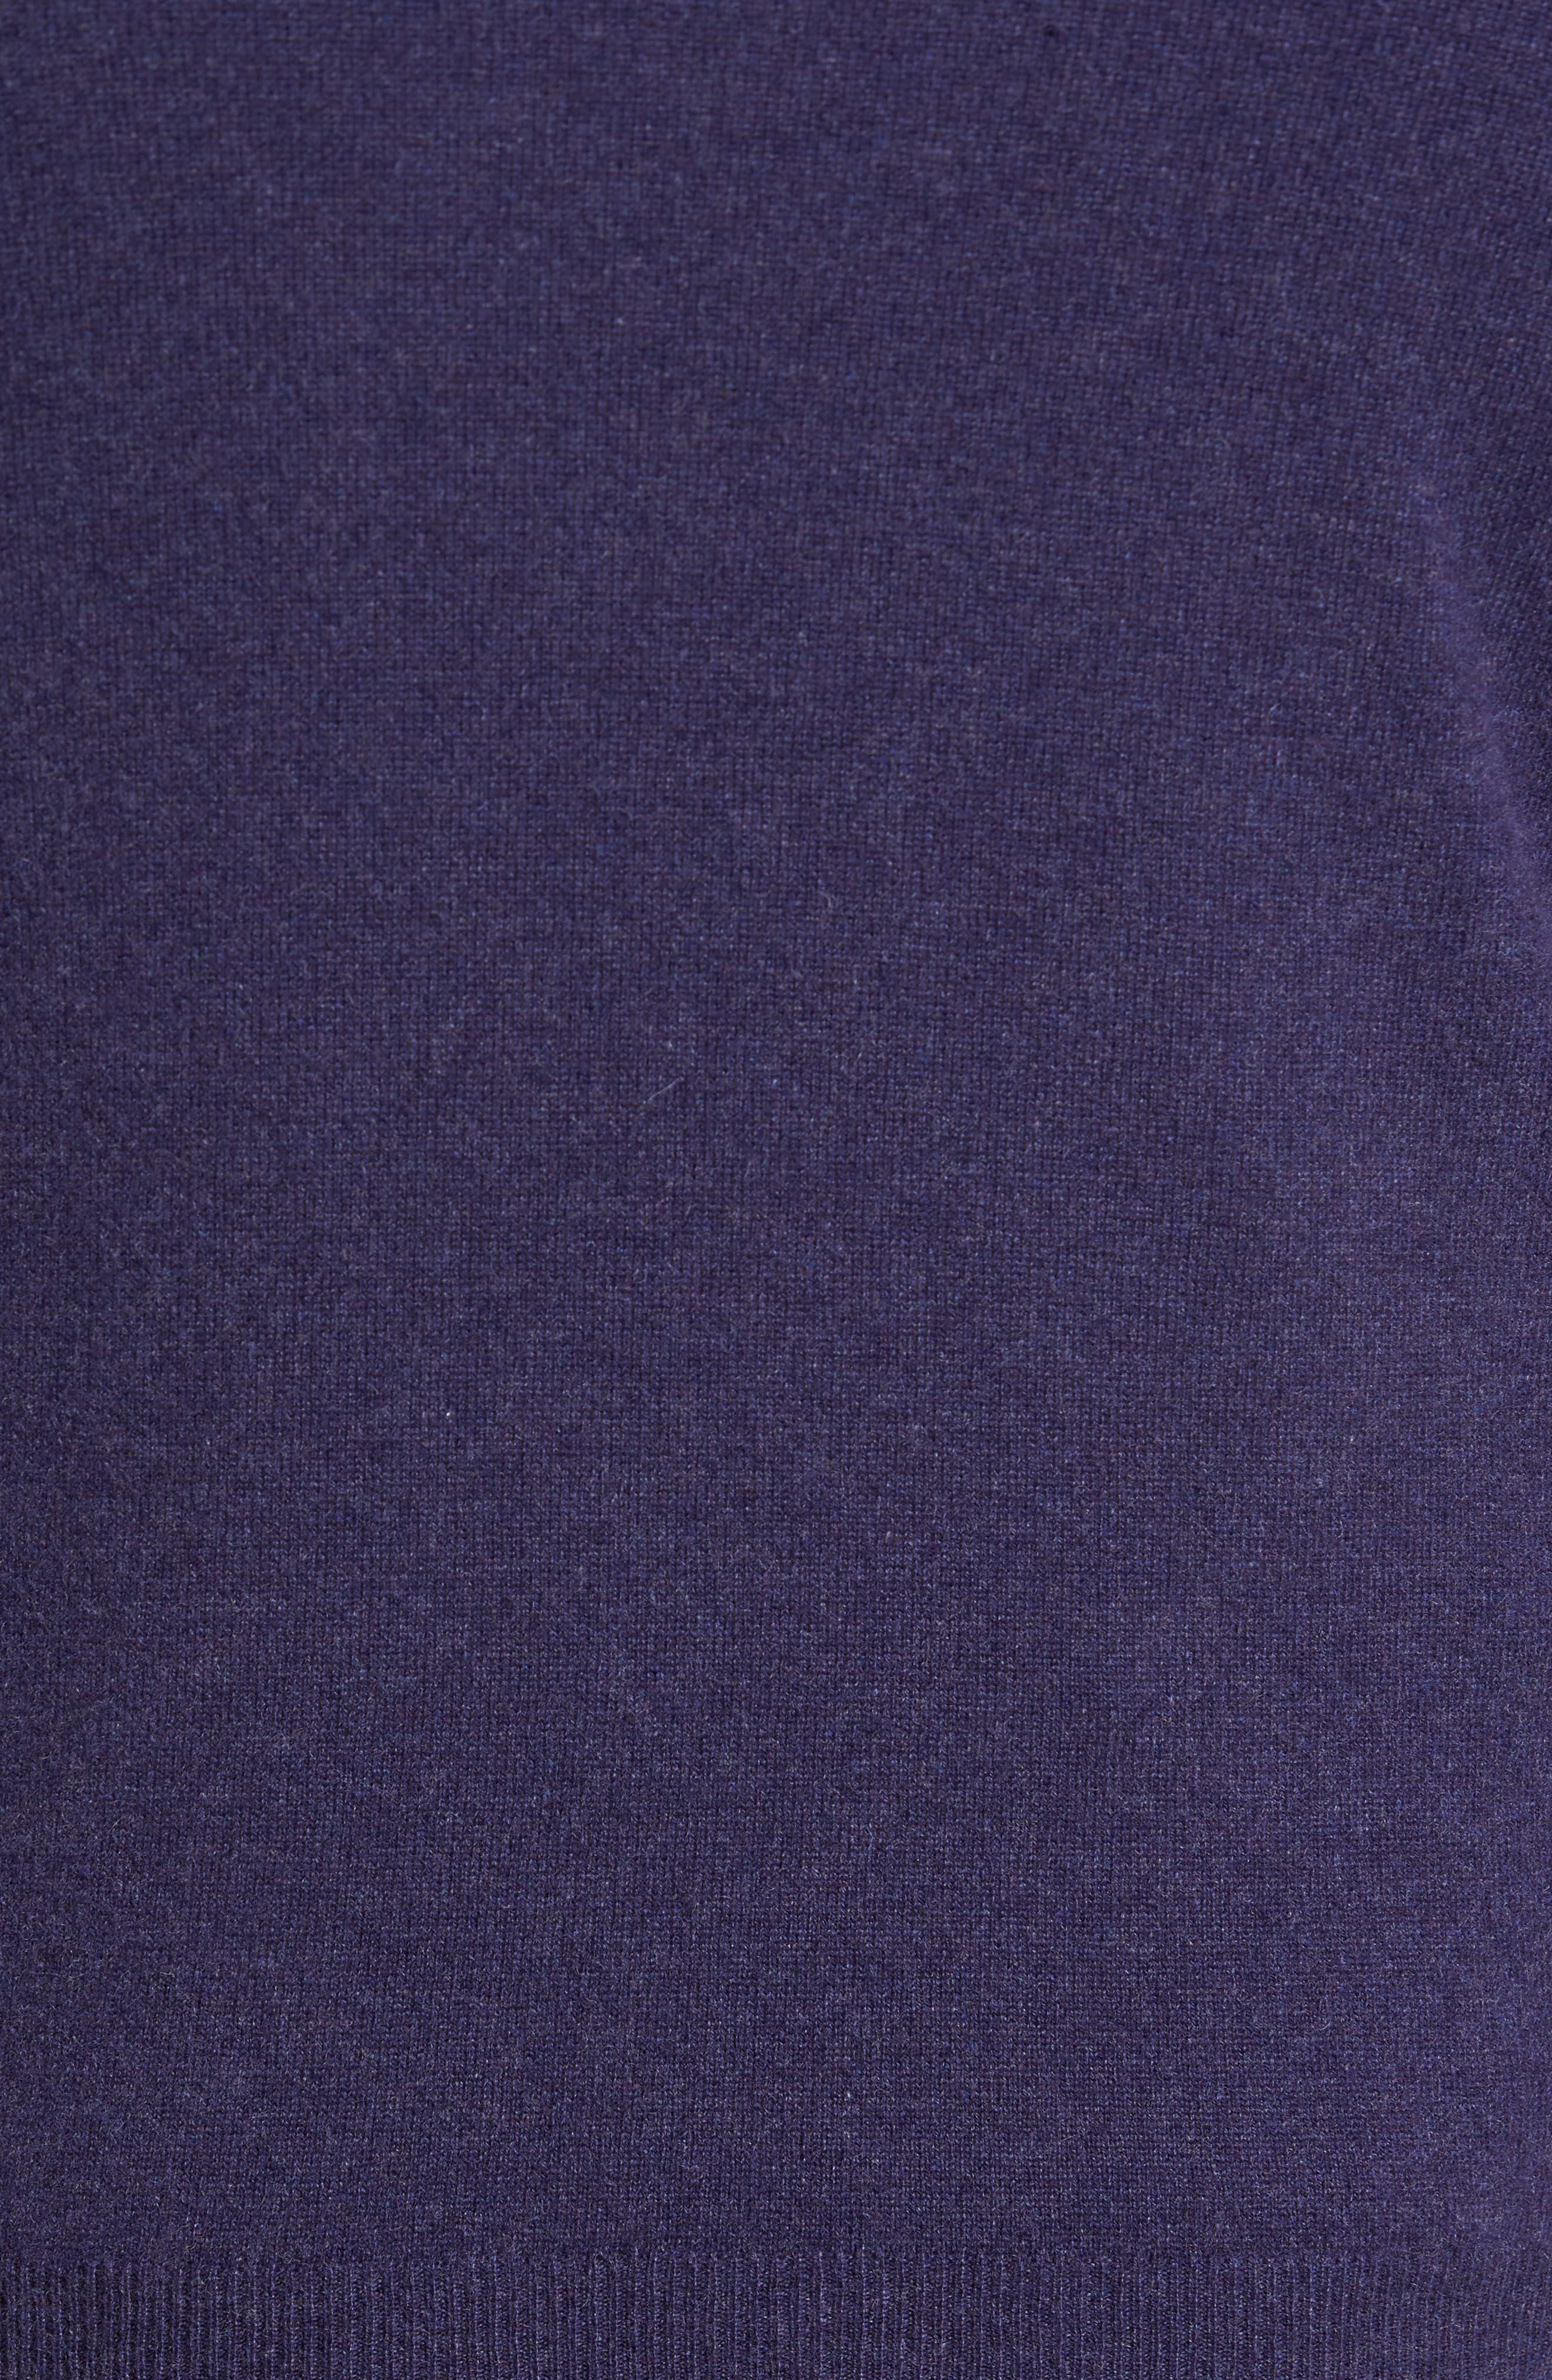 Cashmere V-Neck Sweater,                             Alternate thumbnail 29, color,